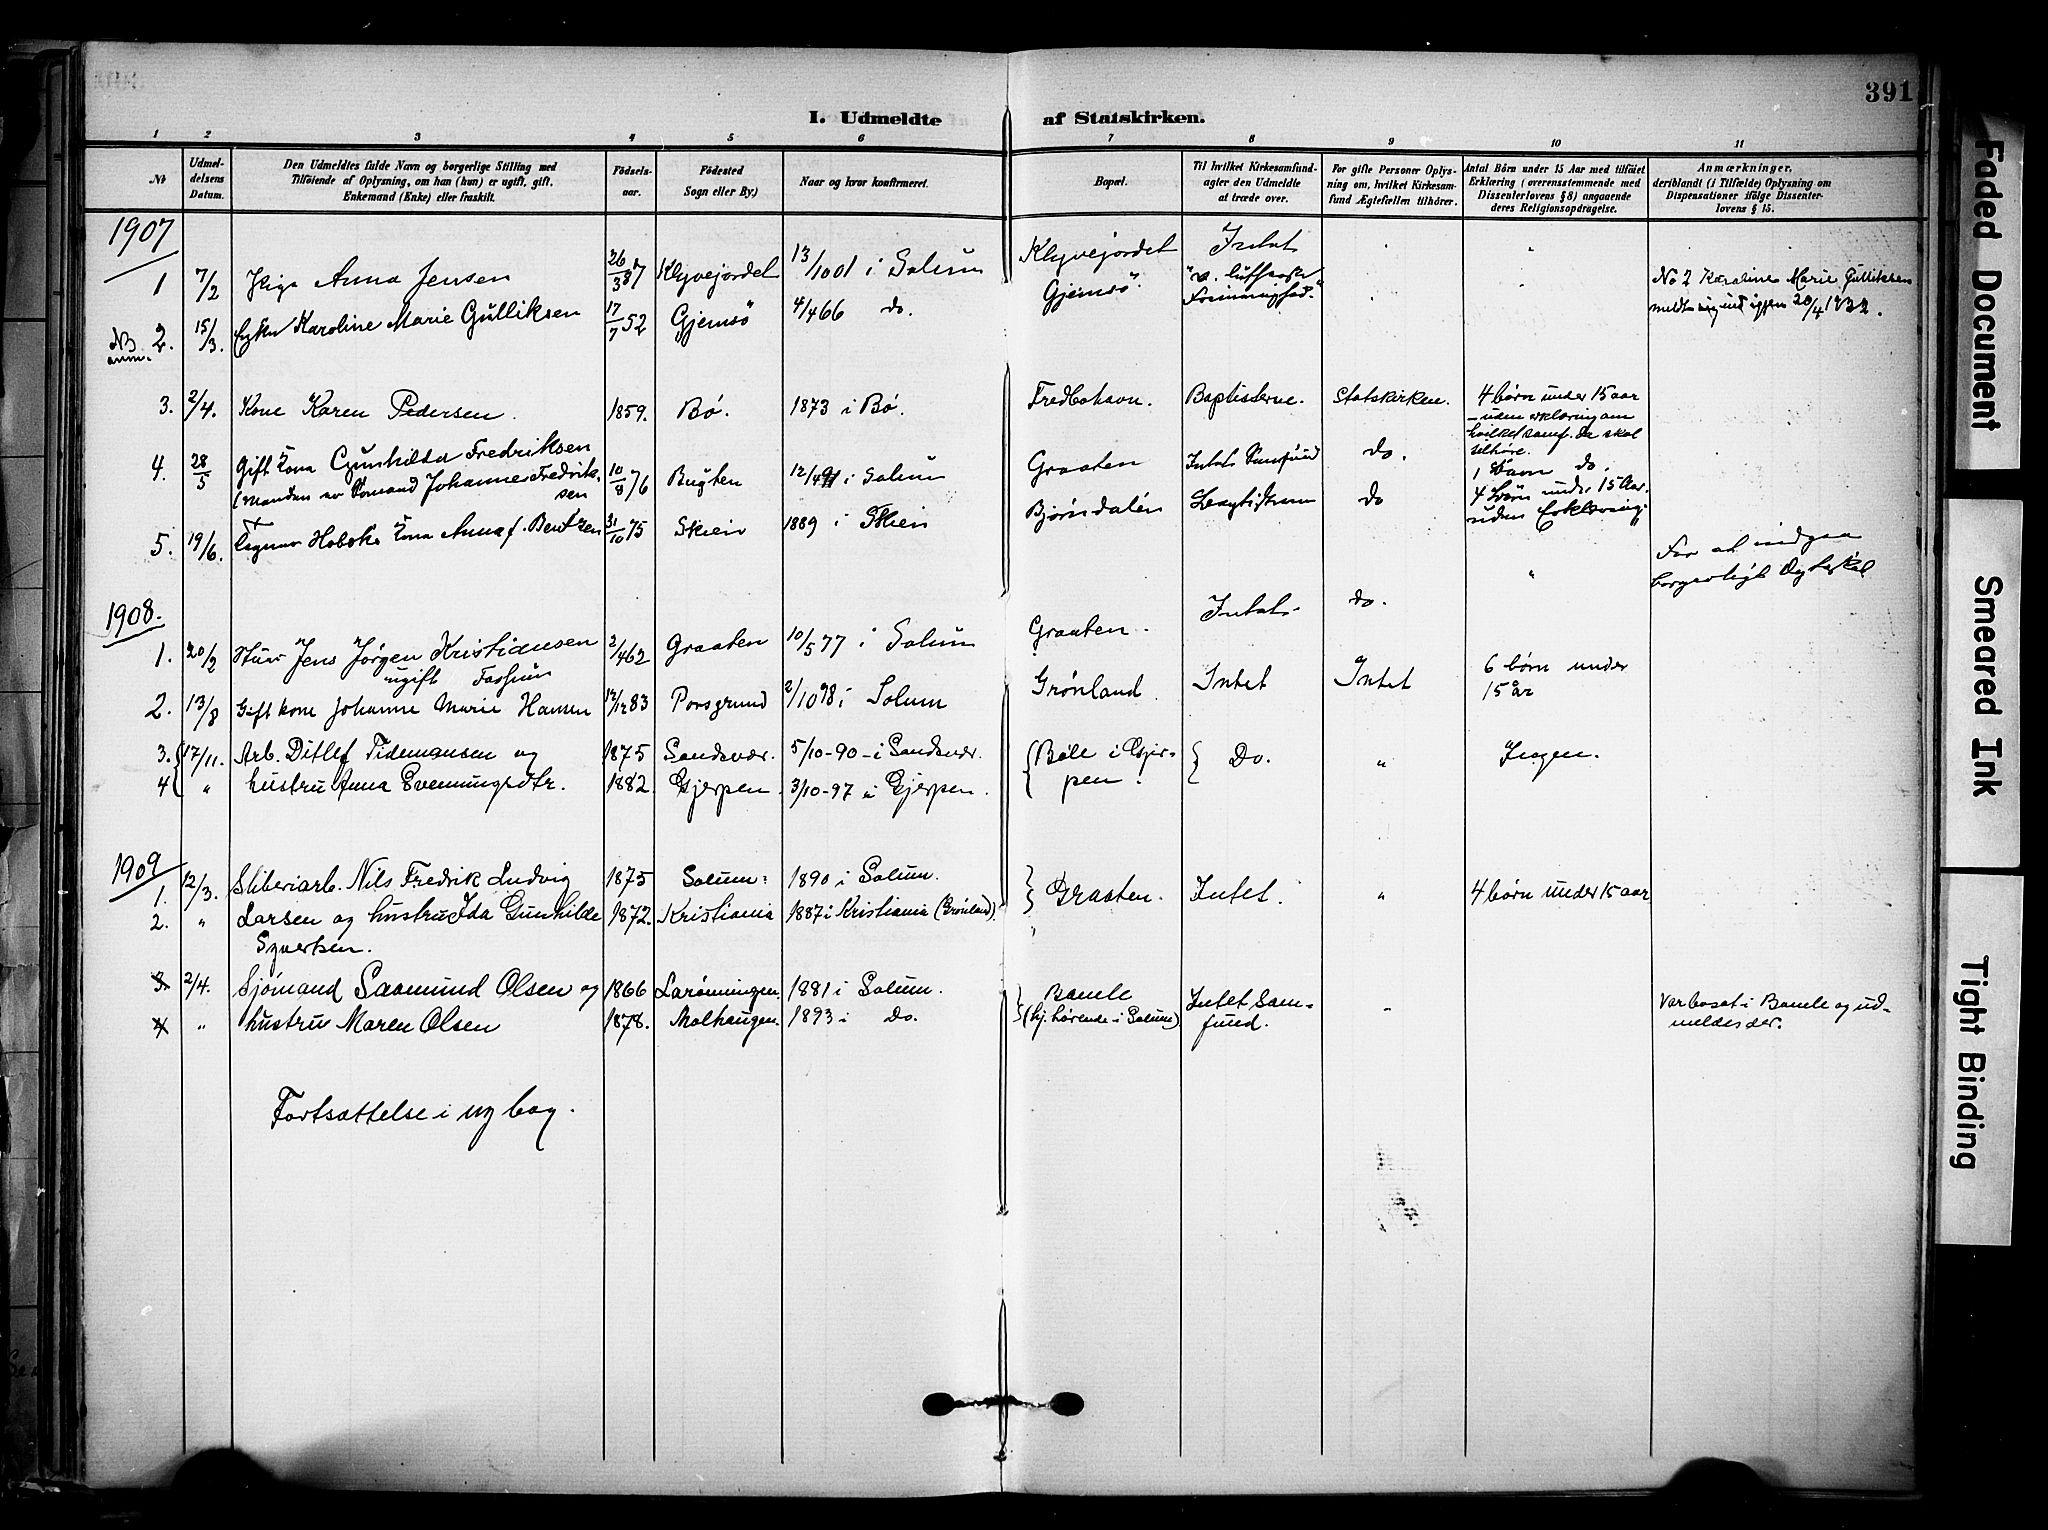 SAKO, Solum kirkebøker, F/Fa/L0011: Ministerialbok nr. I 11, 1898-1909, s. 391